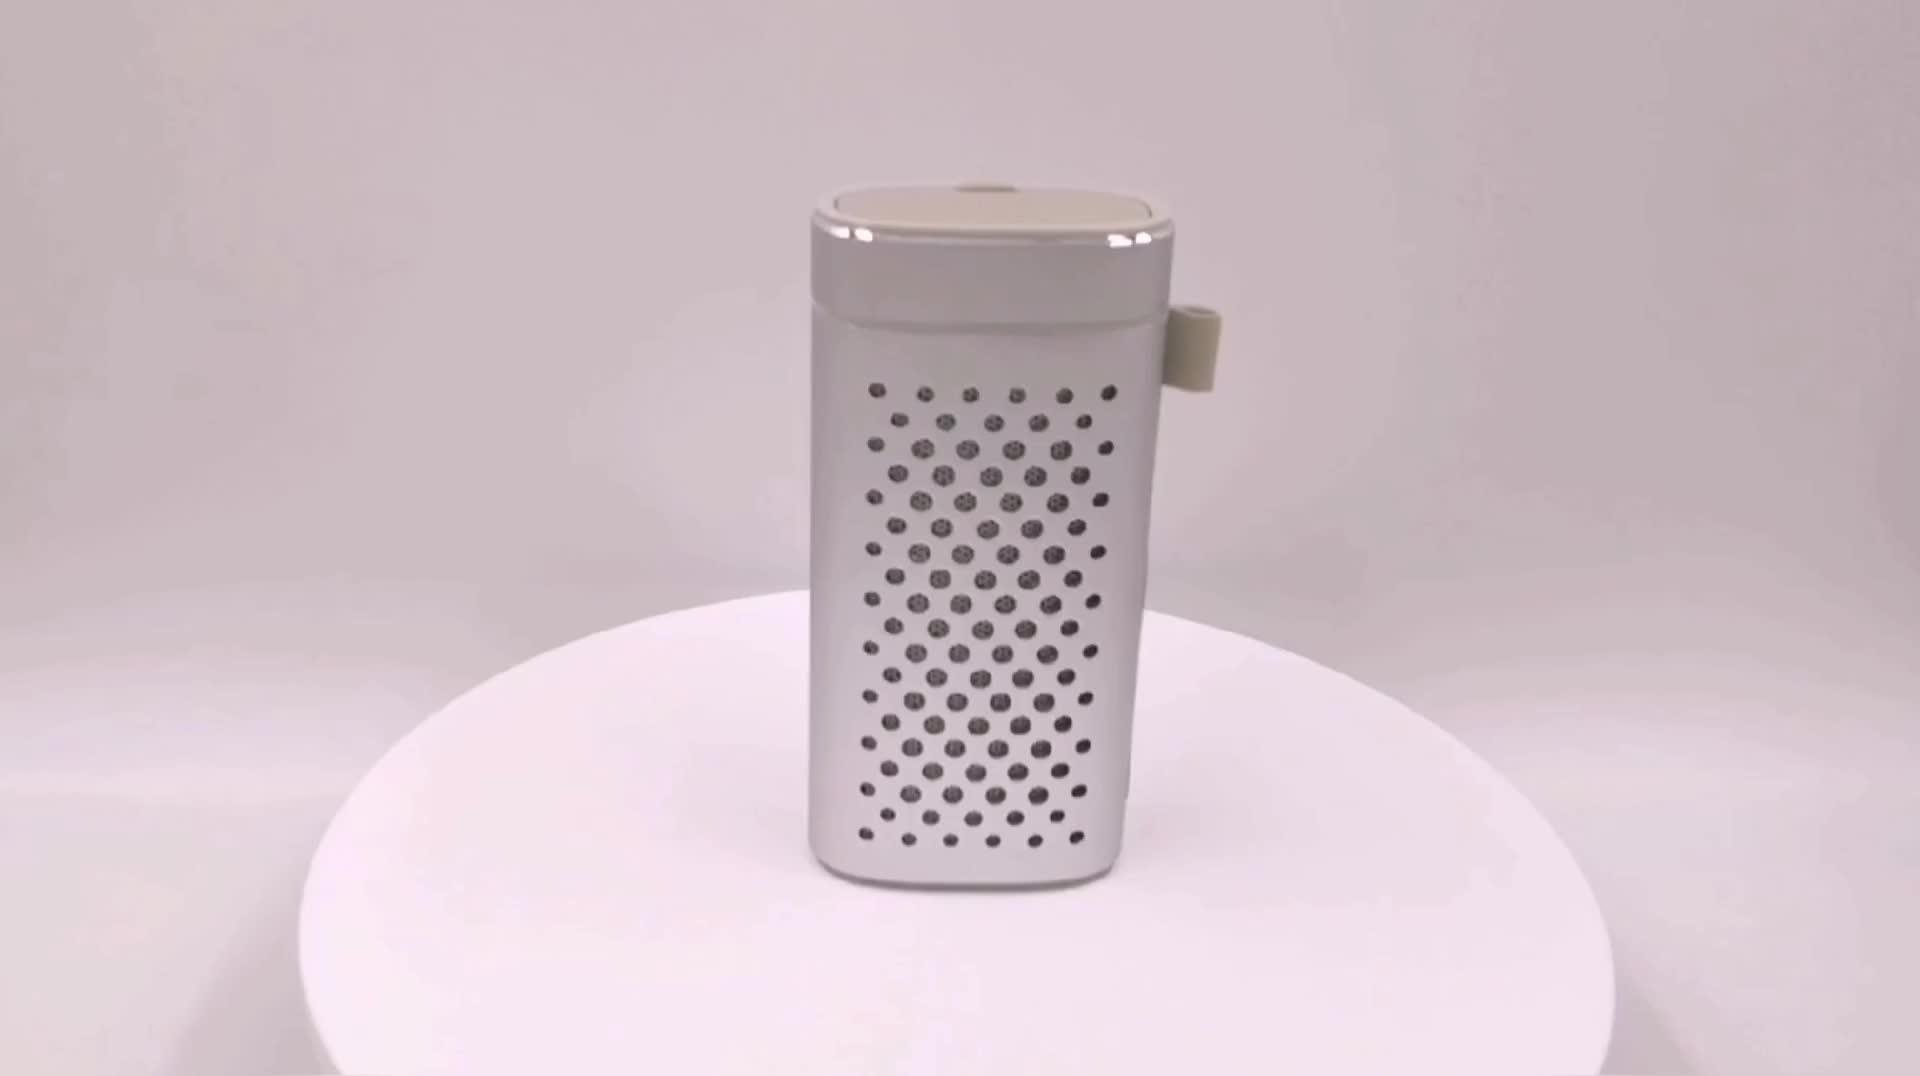 Hifi टॉवर आवाज प्रणाली पोर्टेबल आगमन पतली सबसे अच्छा वाईफ़ाई सीडी Welling वक्ताओं बी. एम. मिनी संचालित छोटे ब्लूटूथ स्पीकर और बिजली